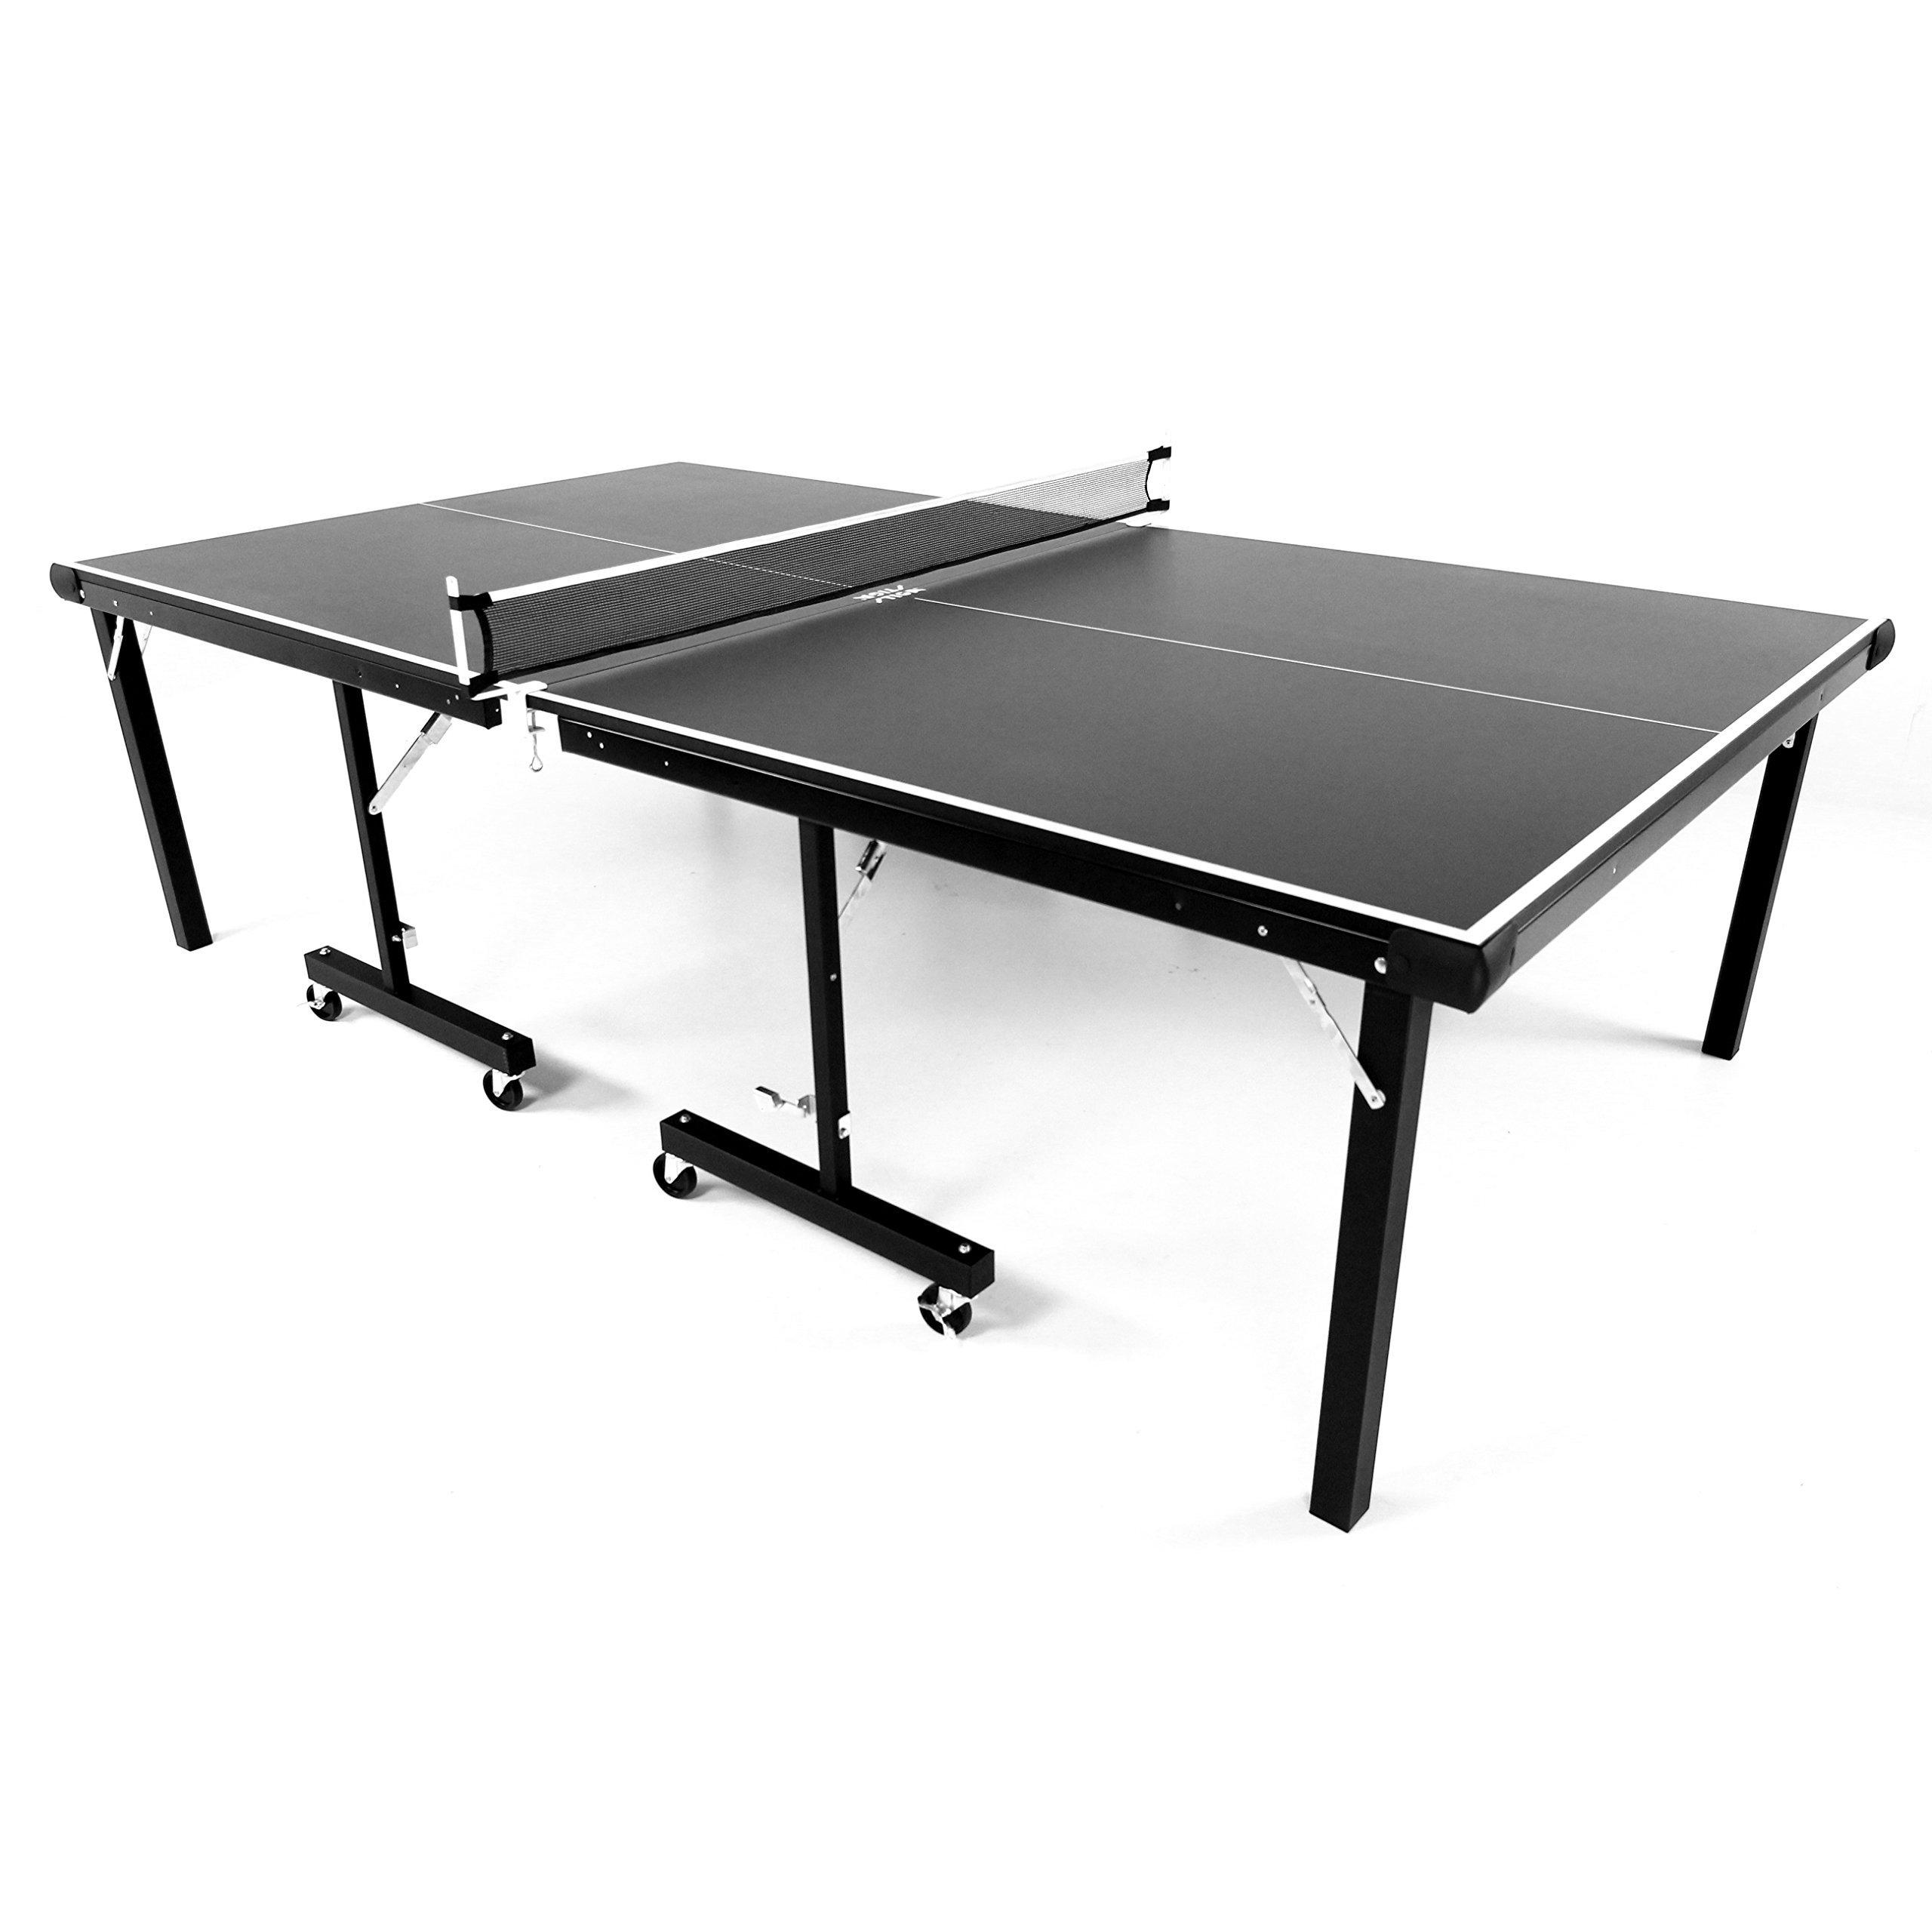 STIGA InstaPlay Table Tennis Table by STIGA